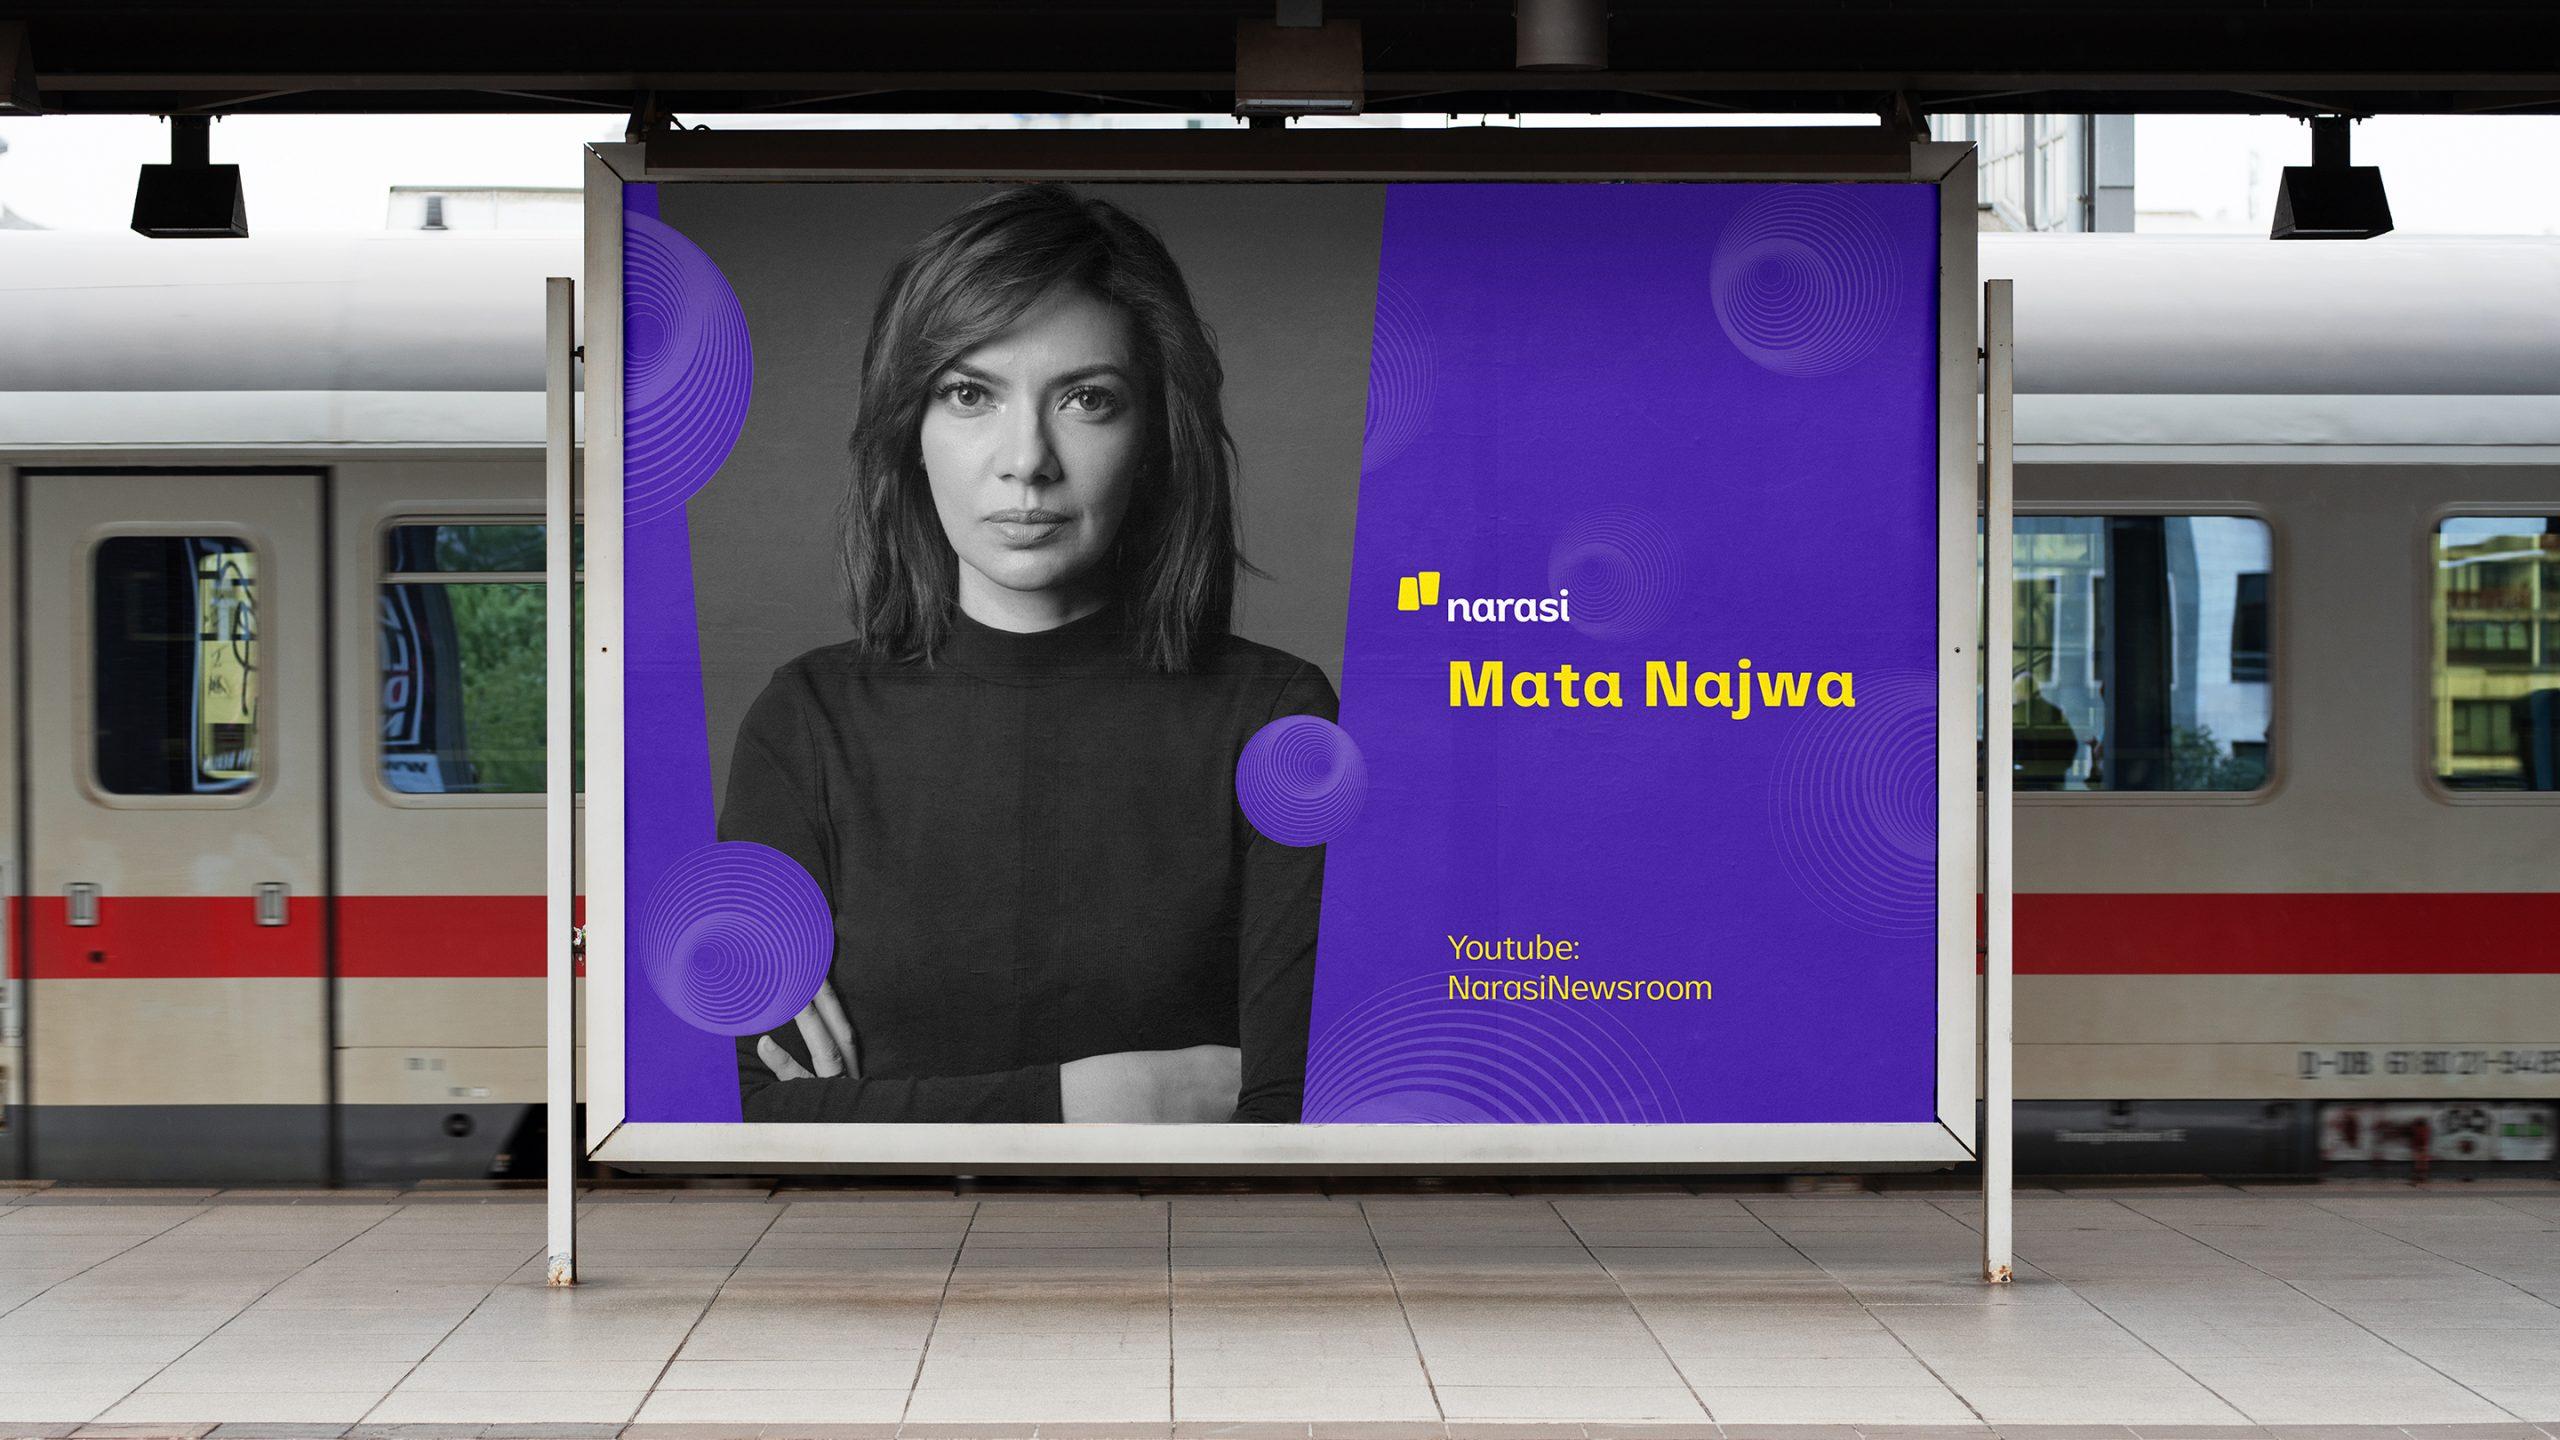 Metro-Station-Billboard-Mockup